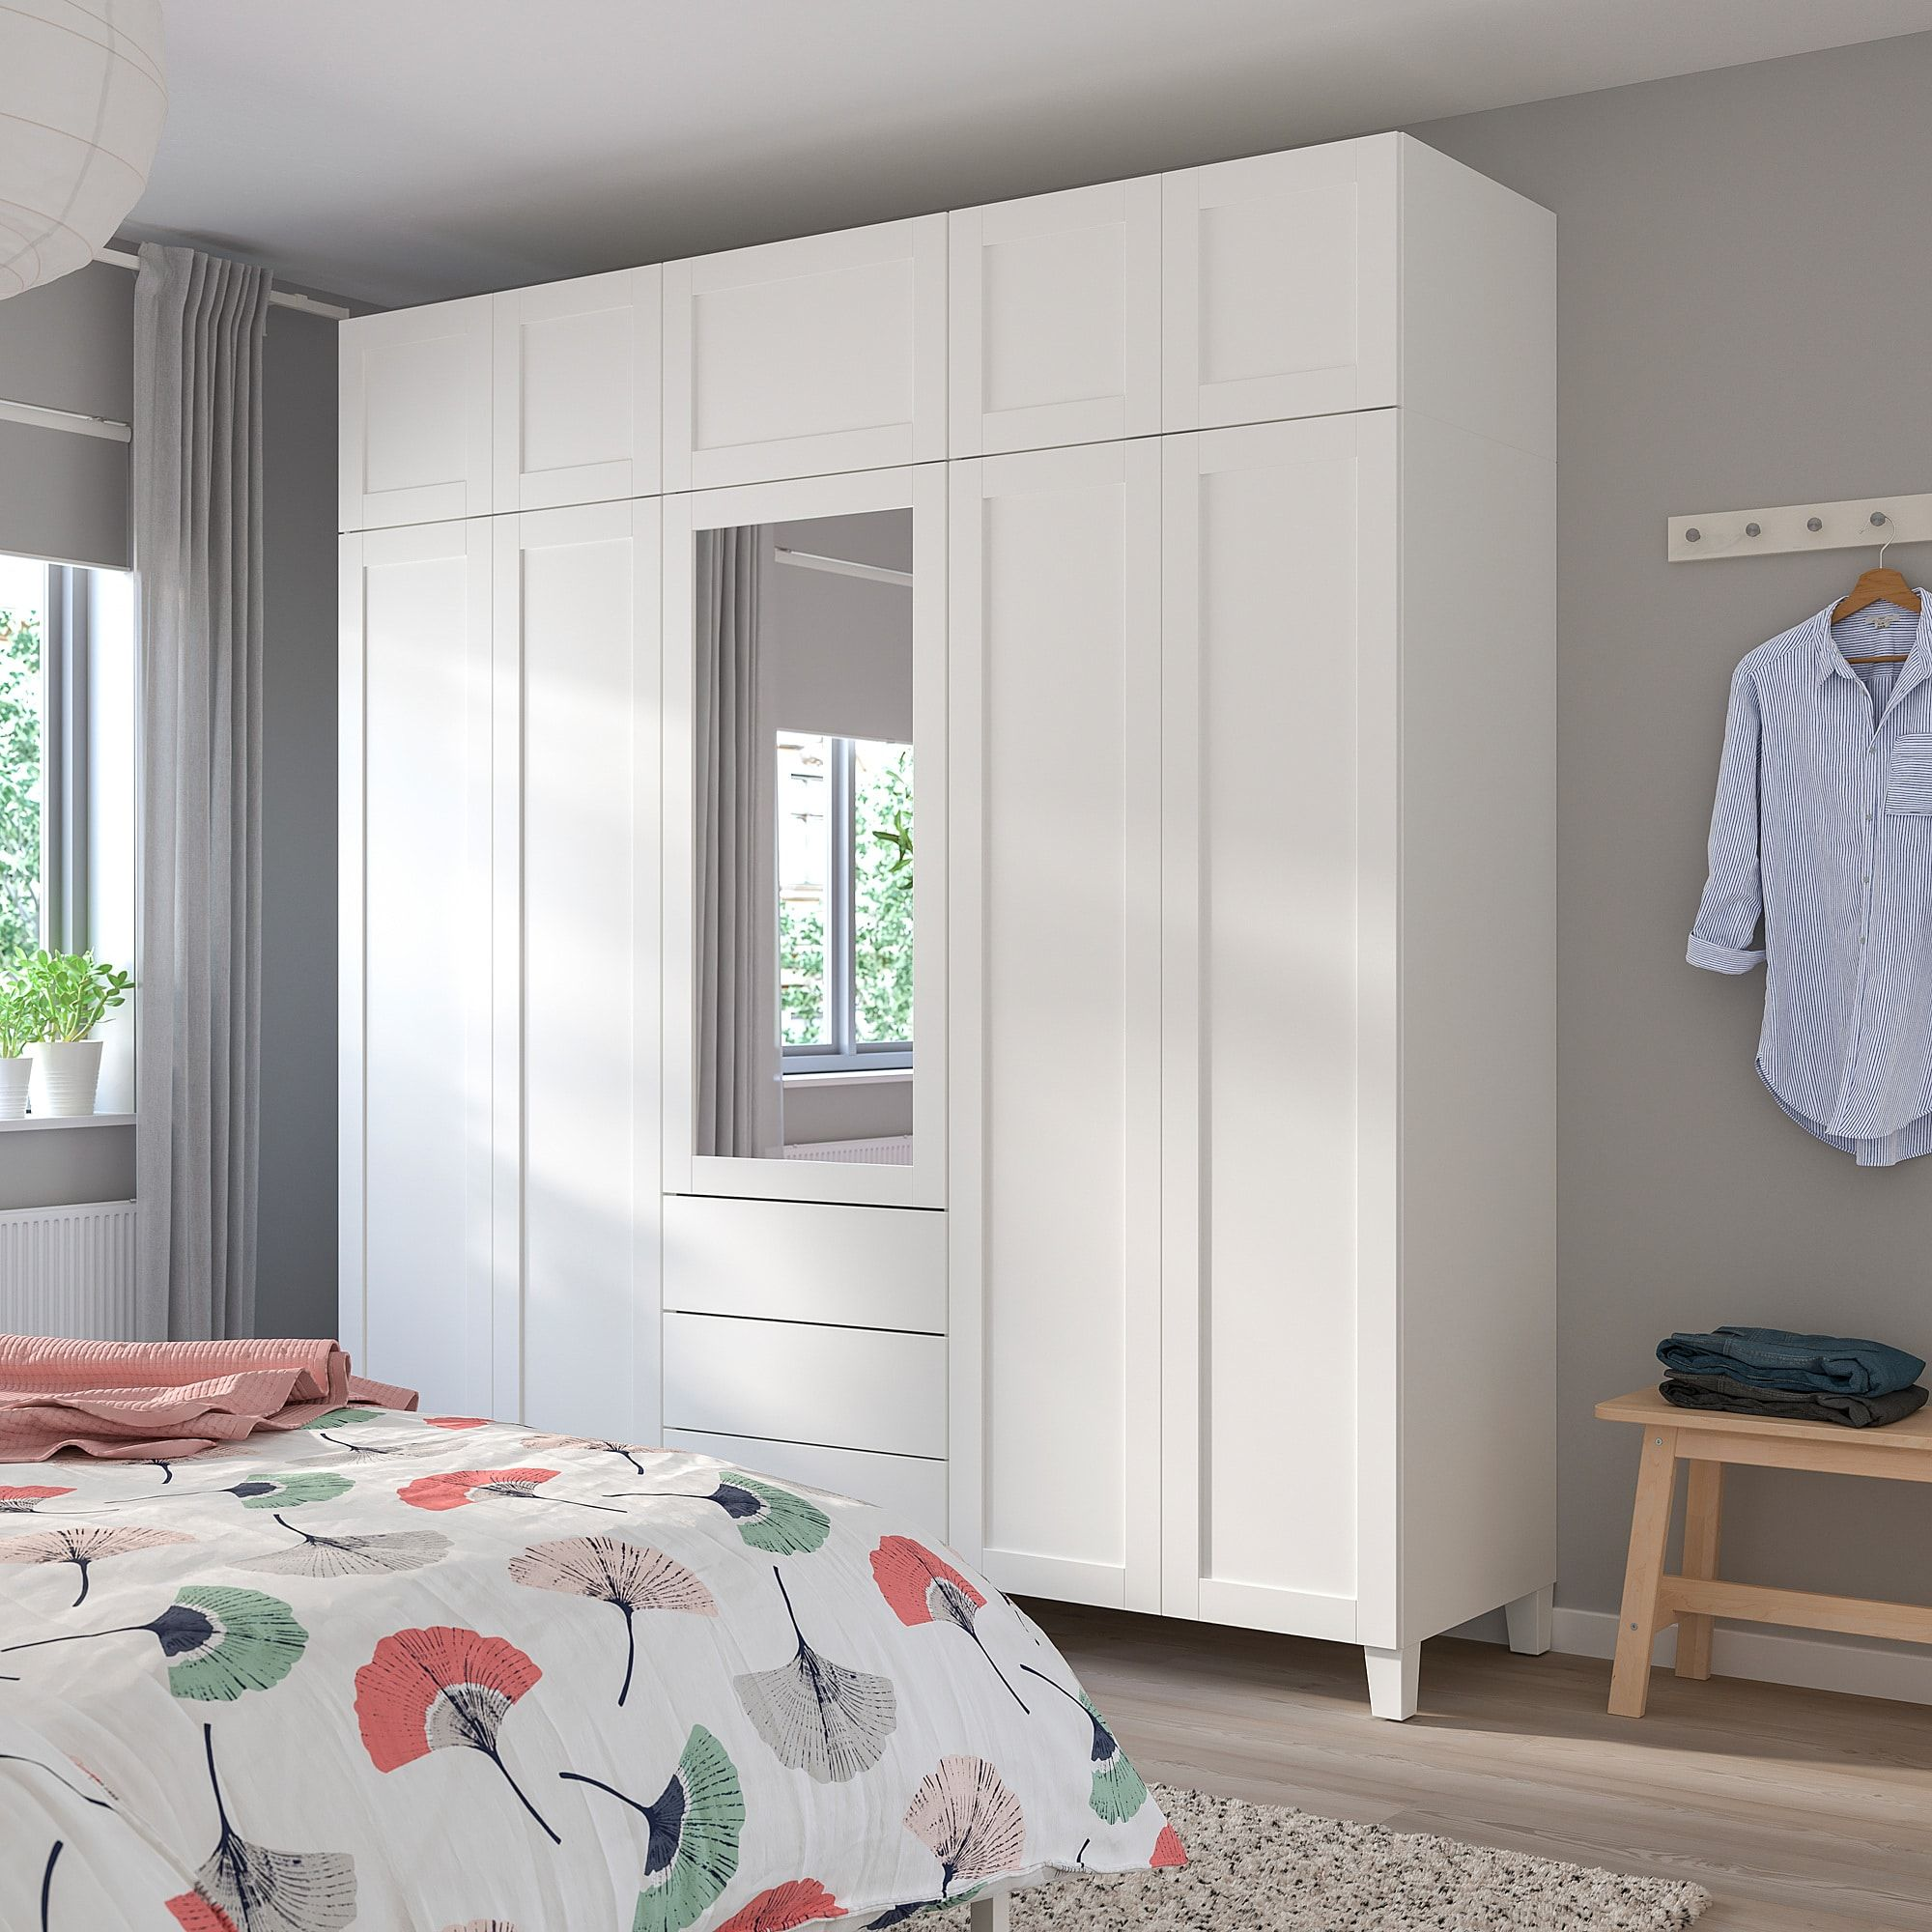 Platsa Wardrobe White Sannidal Ridabu 220x57x231 Cm In 2020